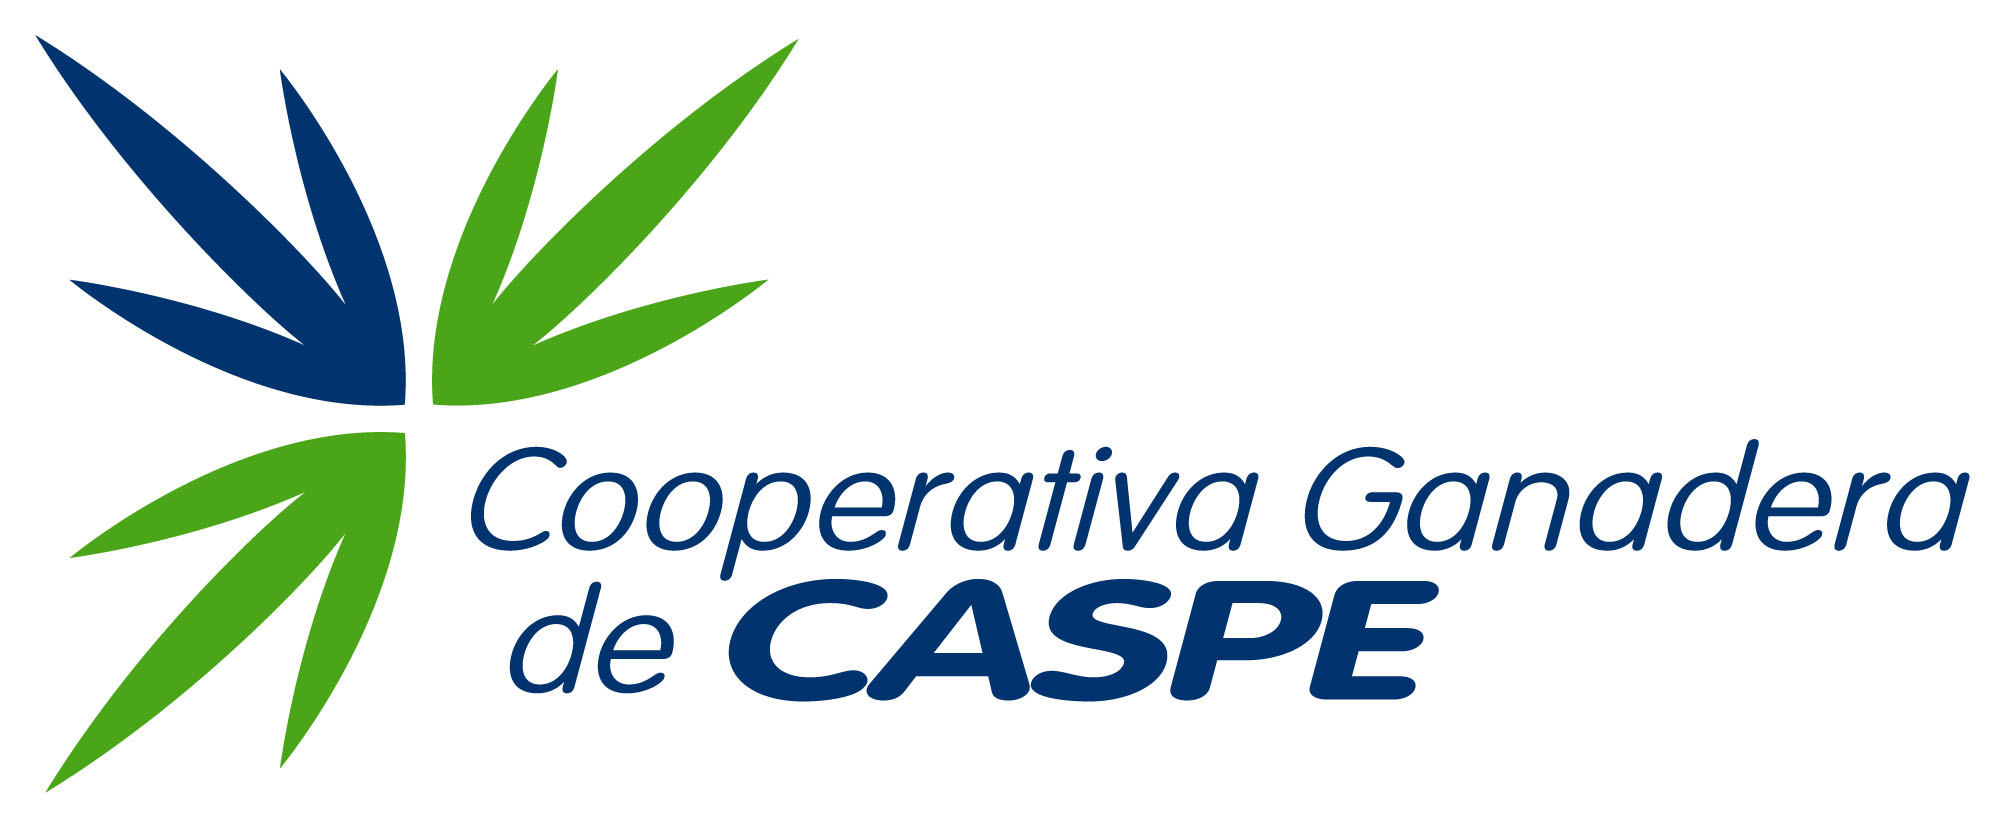 Cooperativa Ganadera de Caspe